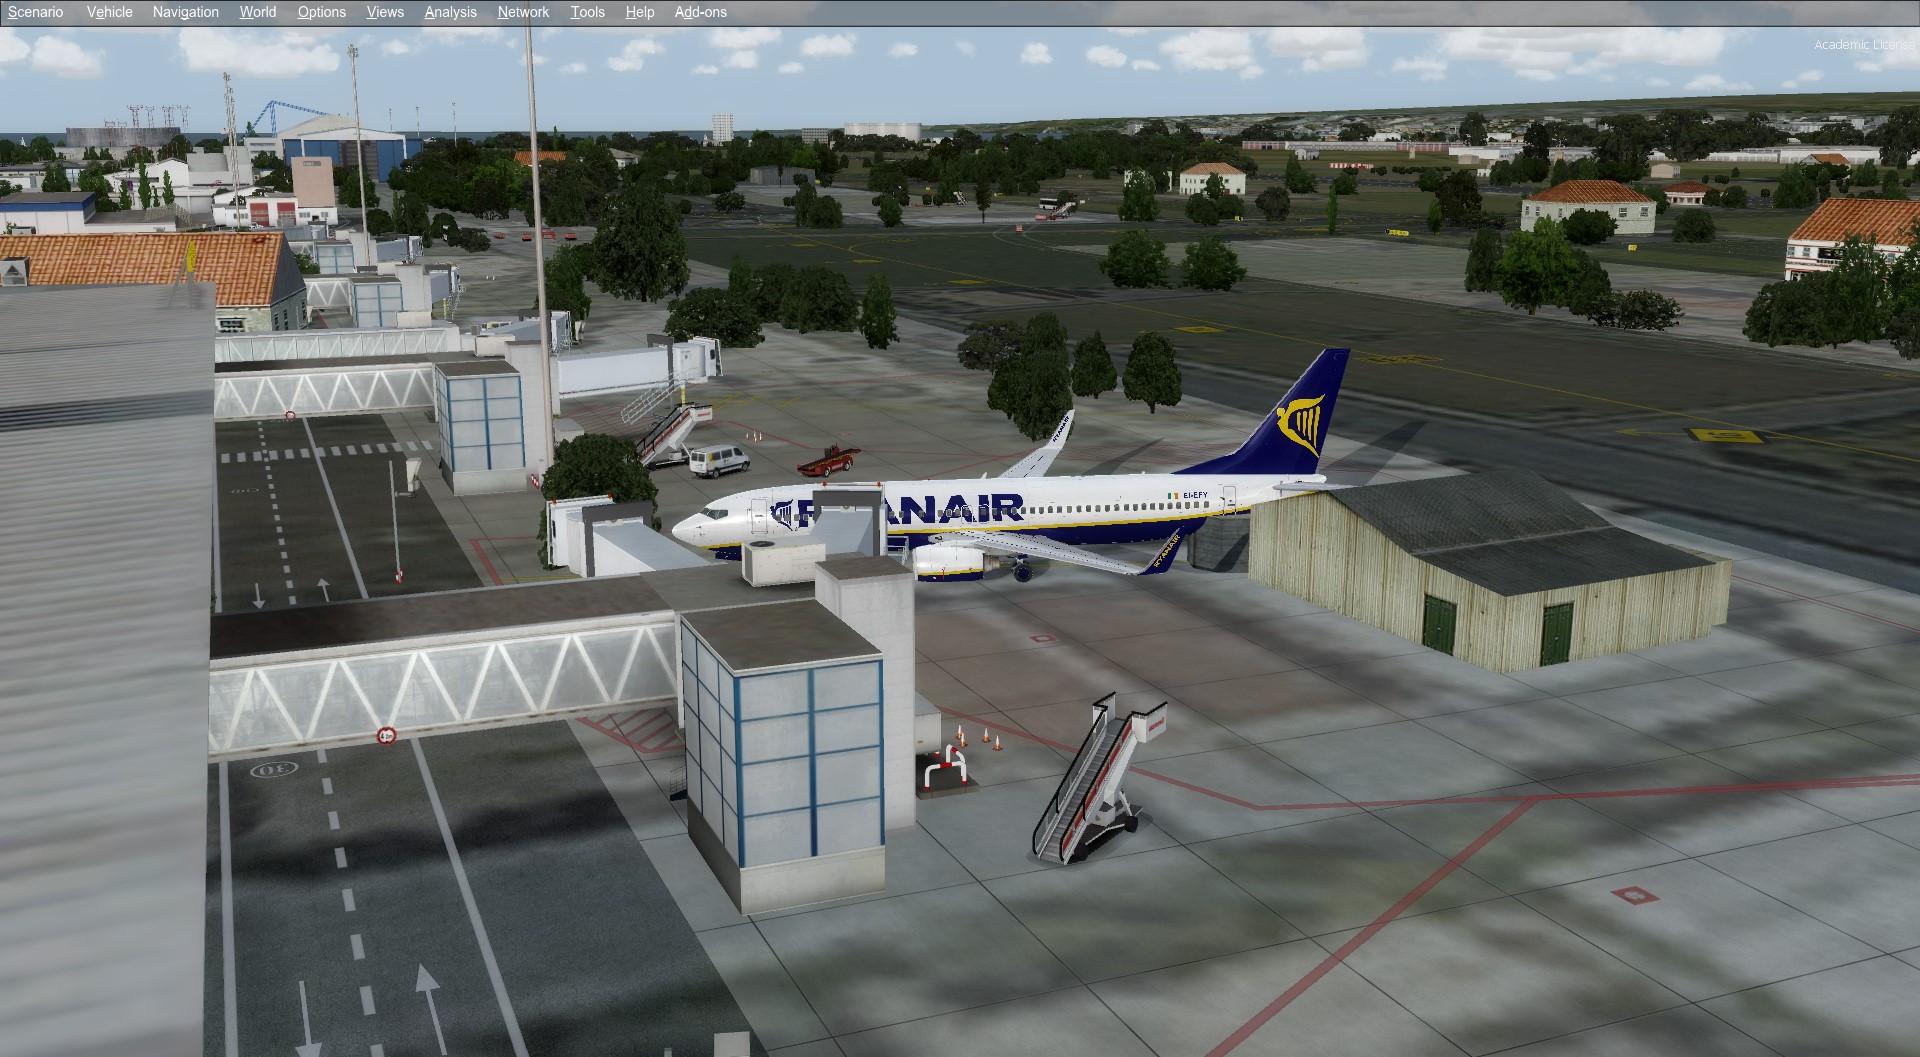 Mallorca X - Aerosoft Scenery - AEROSOFT COMMUNITY SERVICES